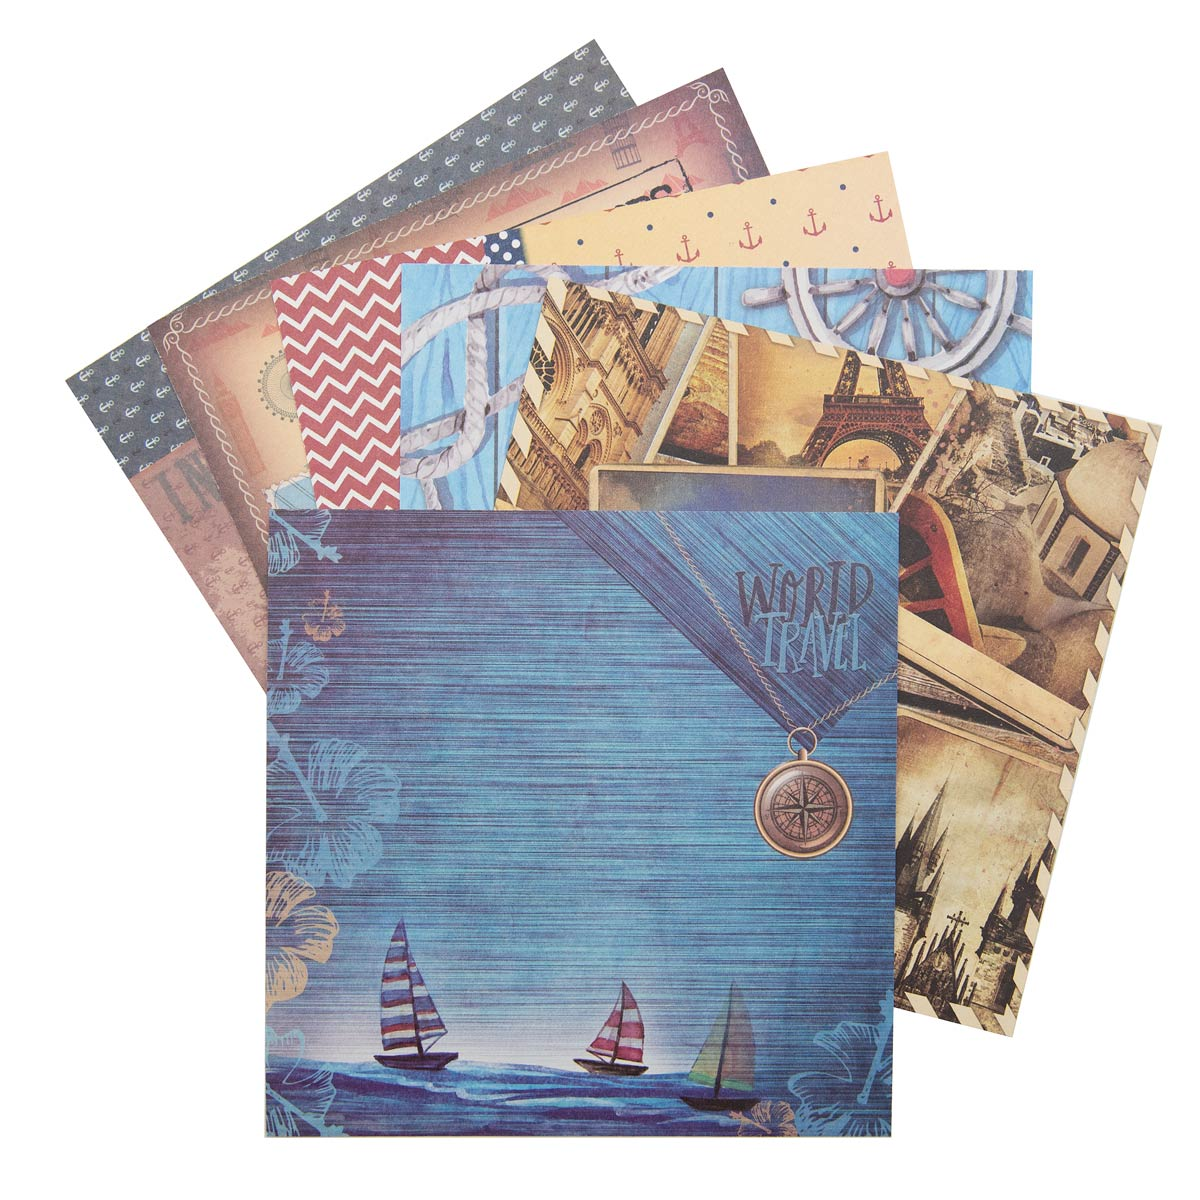 С2781-03 Цветная бумага для скрапбукинга. 6л. 15x15 'Путешествия'.